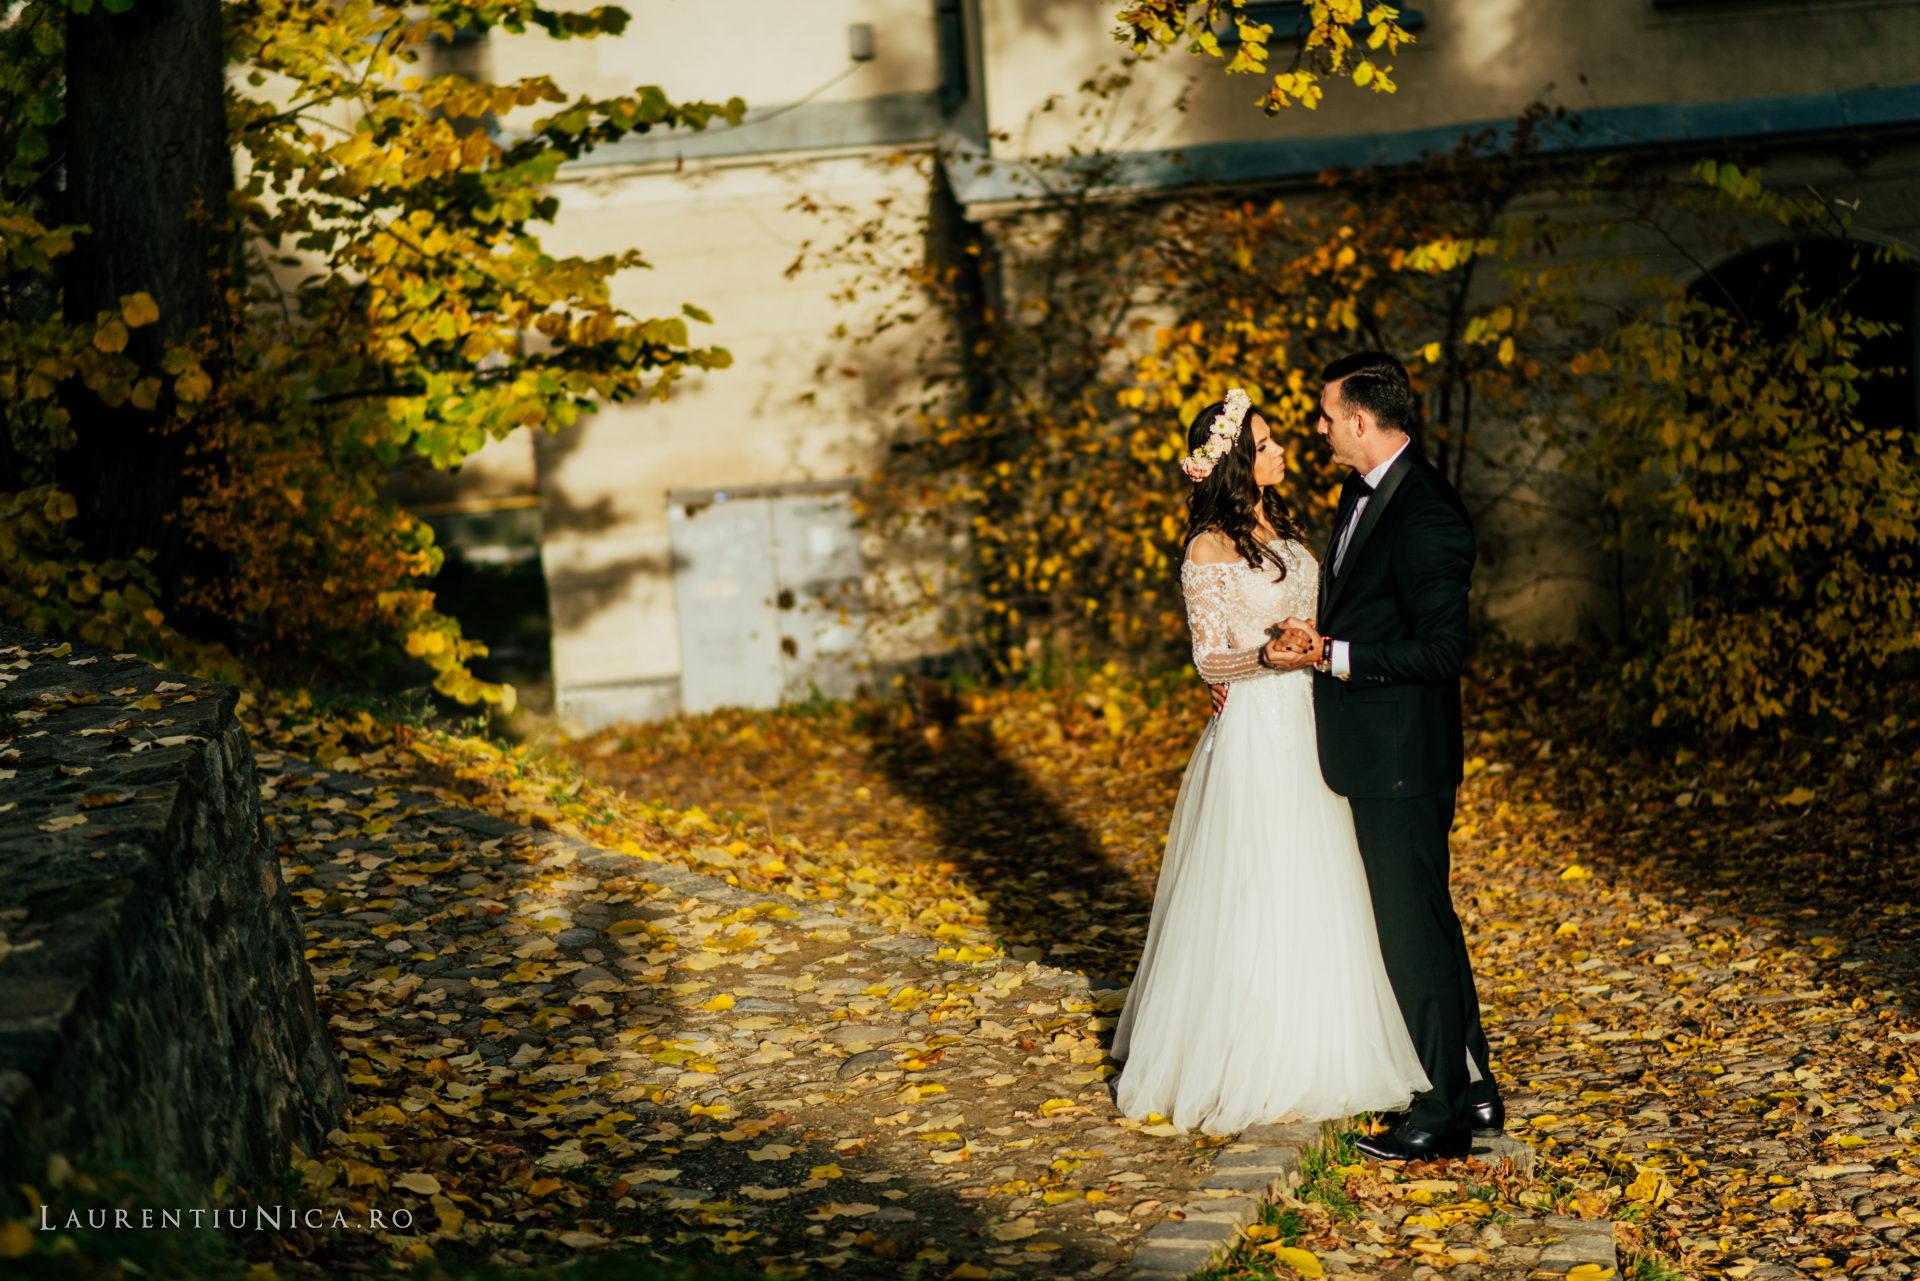 lili-si-dan-fotografii-nunta-after-wedding-sighisoara-laurentiu-nica29